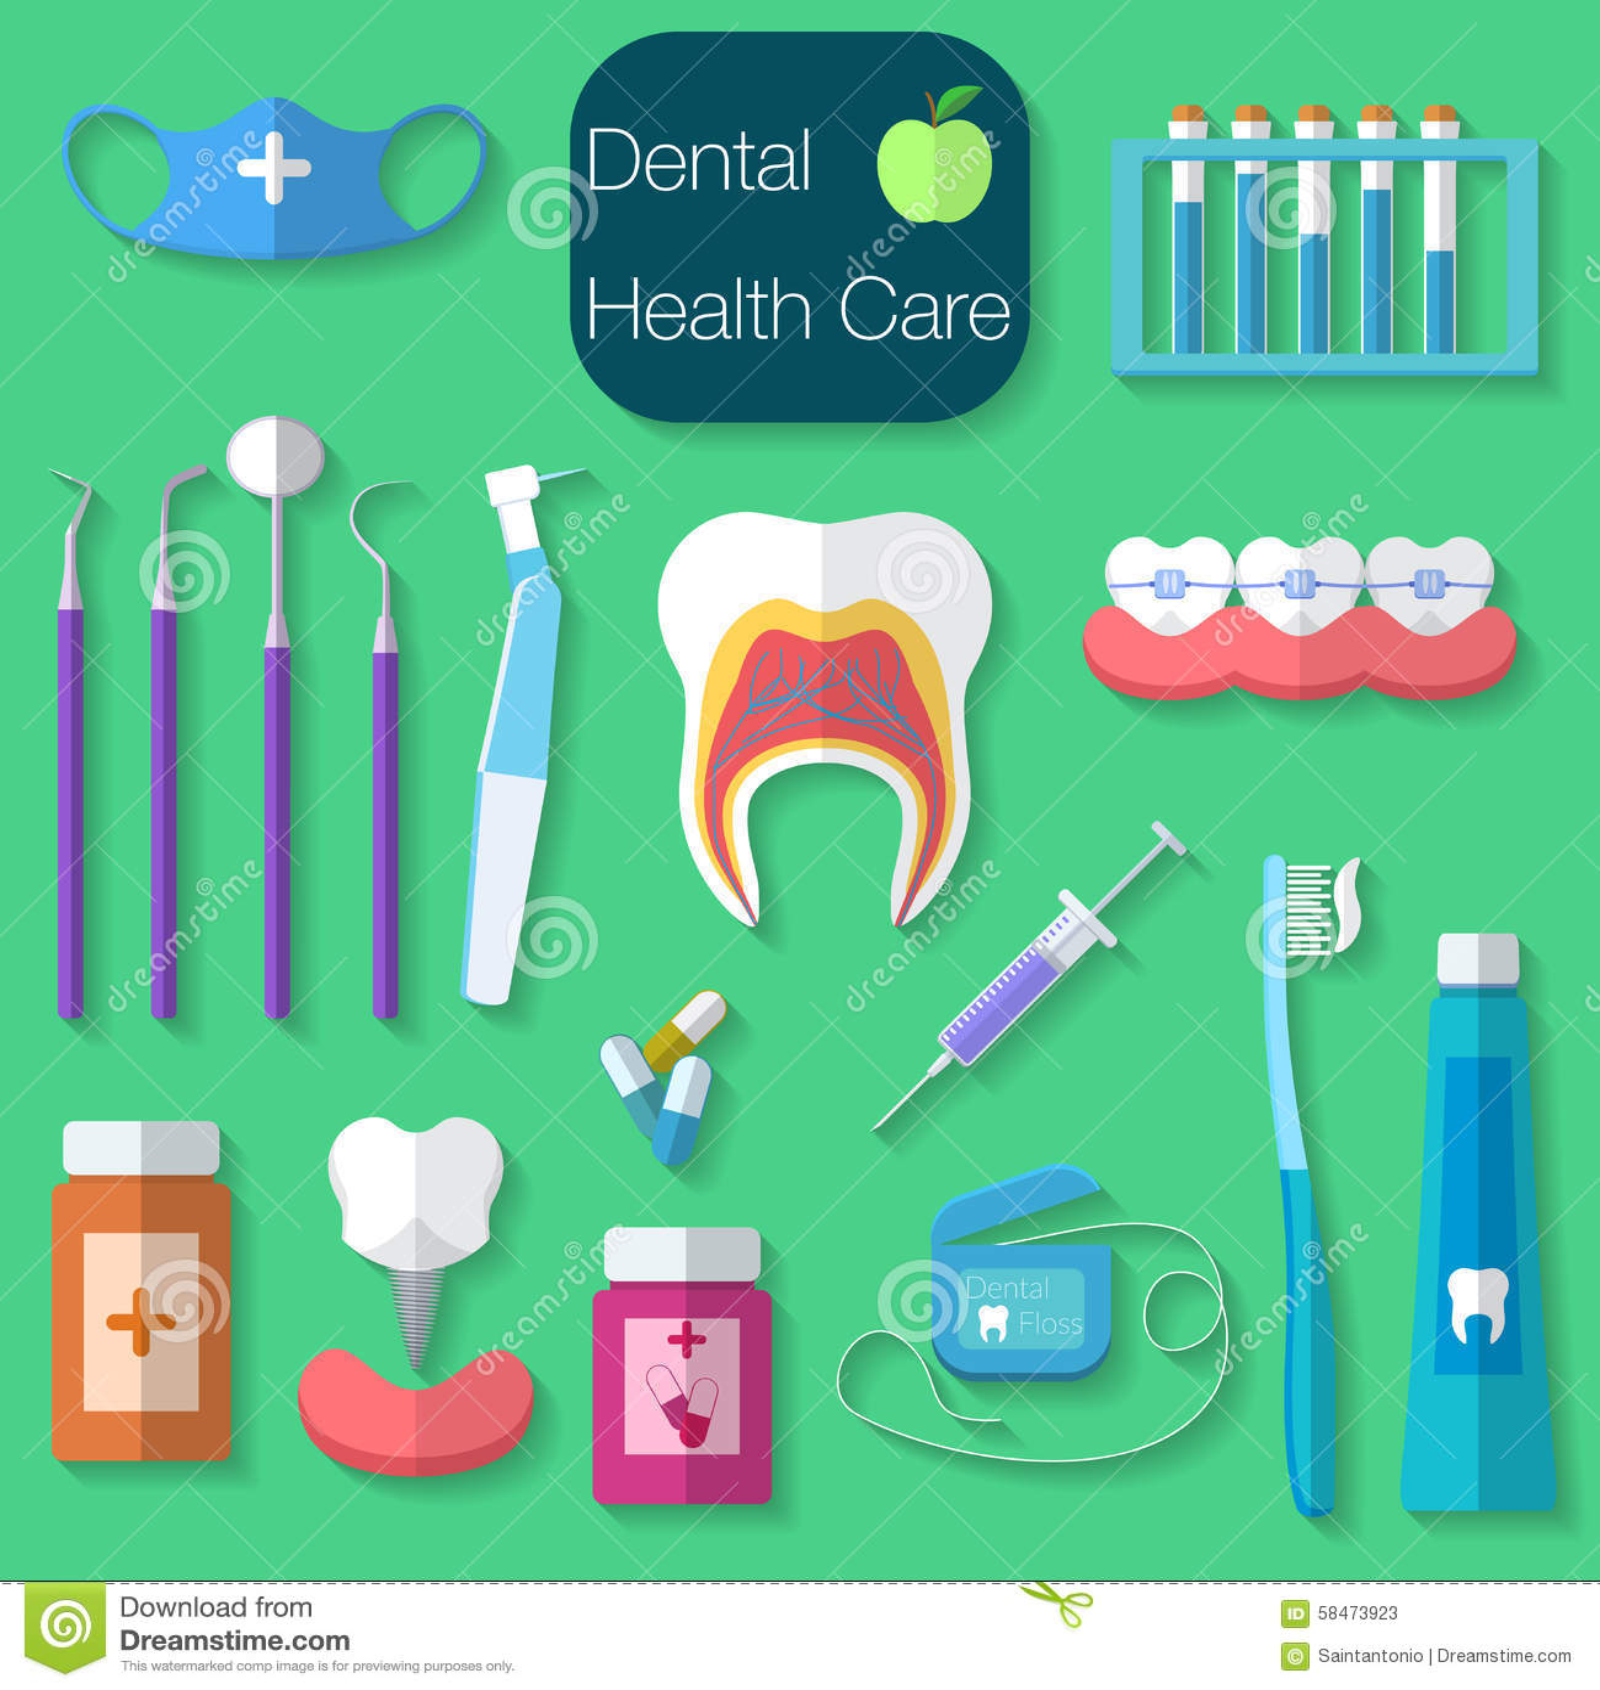 dental-care-flat-design-vector-illustration-dental-floss-teeth-mouth-tooth-paste-brush-medicine-syringe-dentist-58473923.jpg